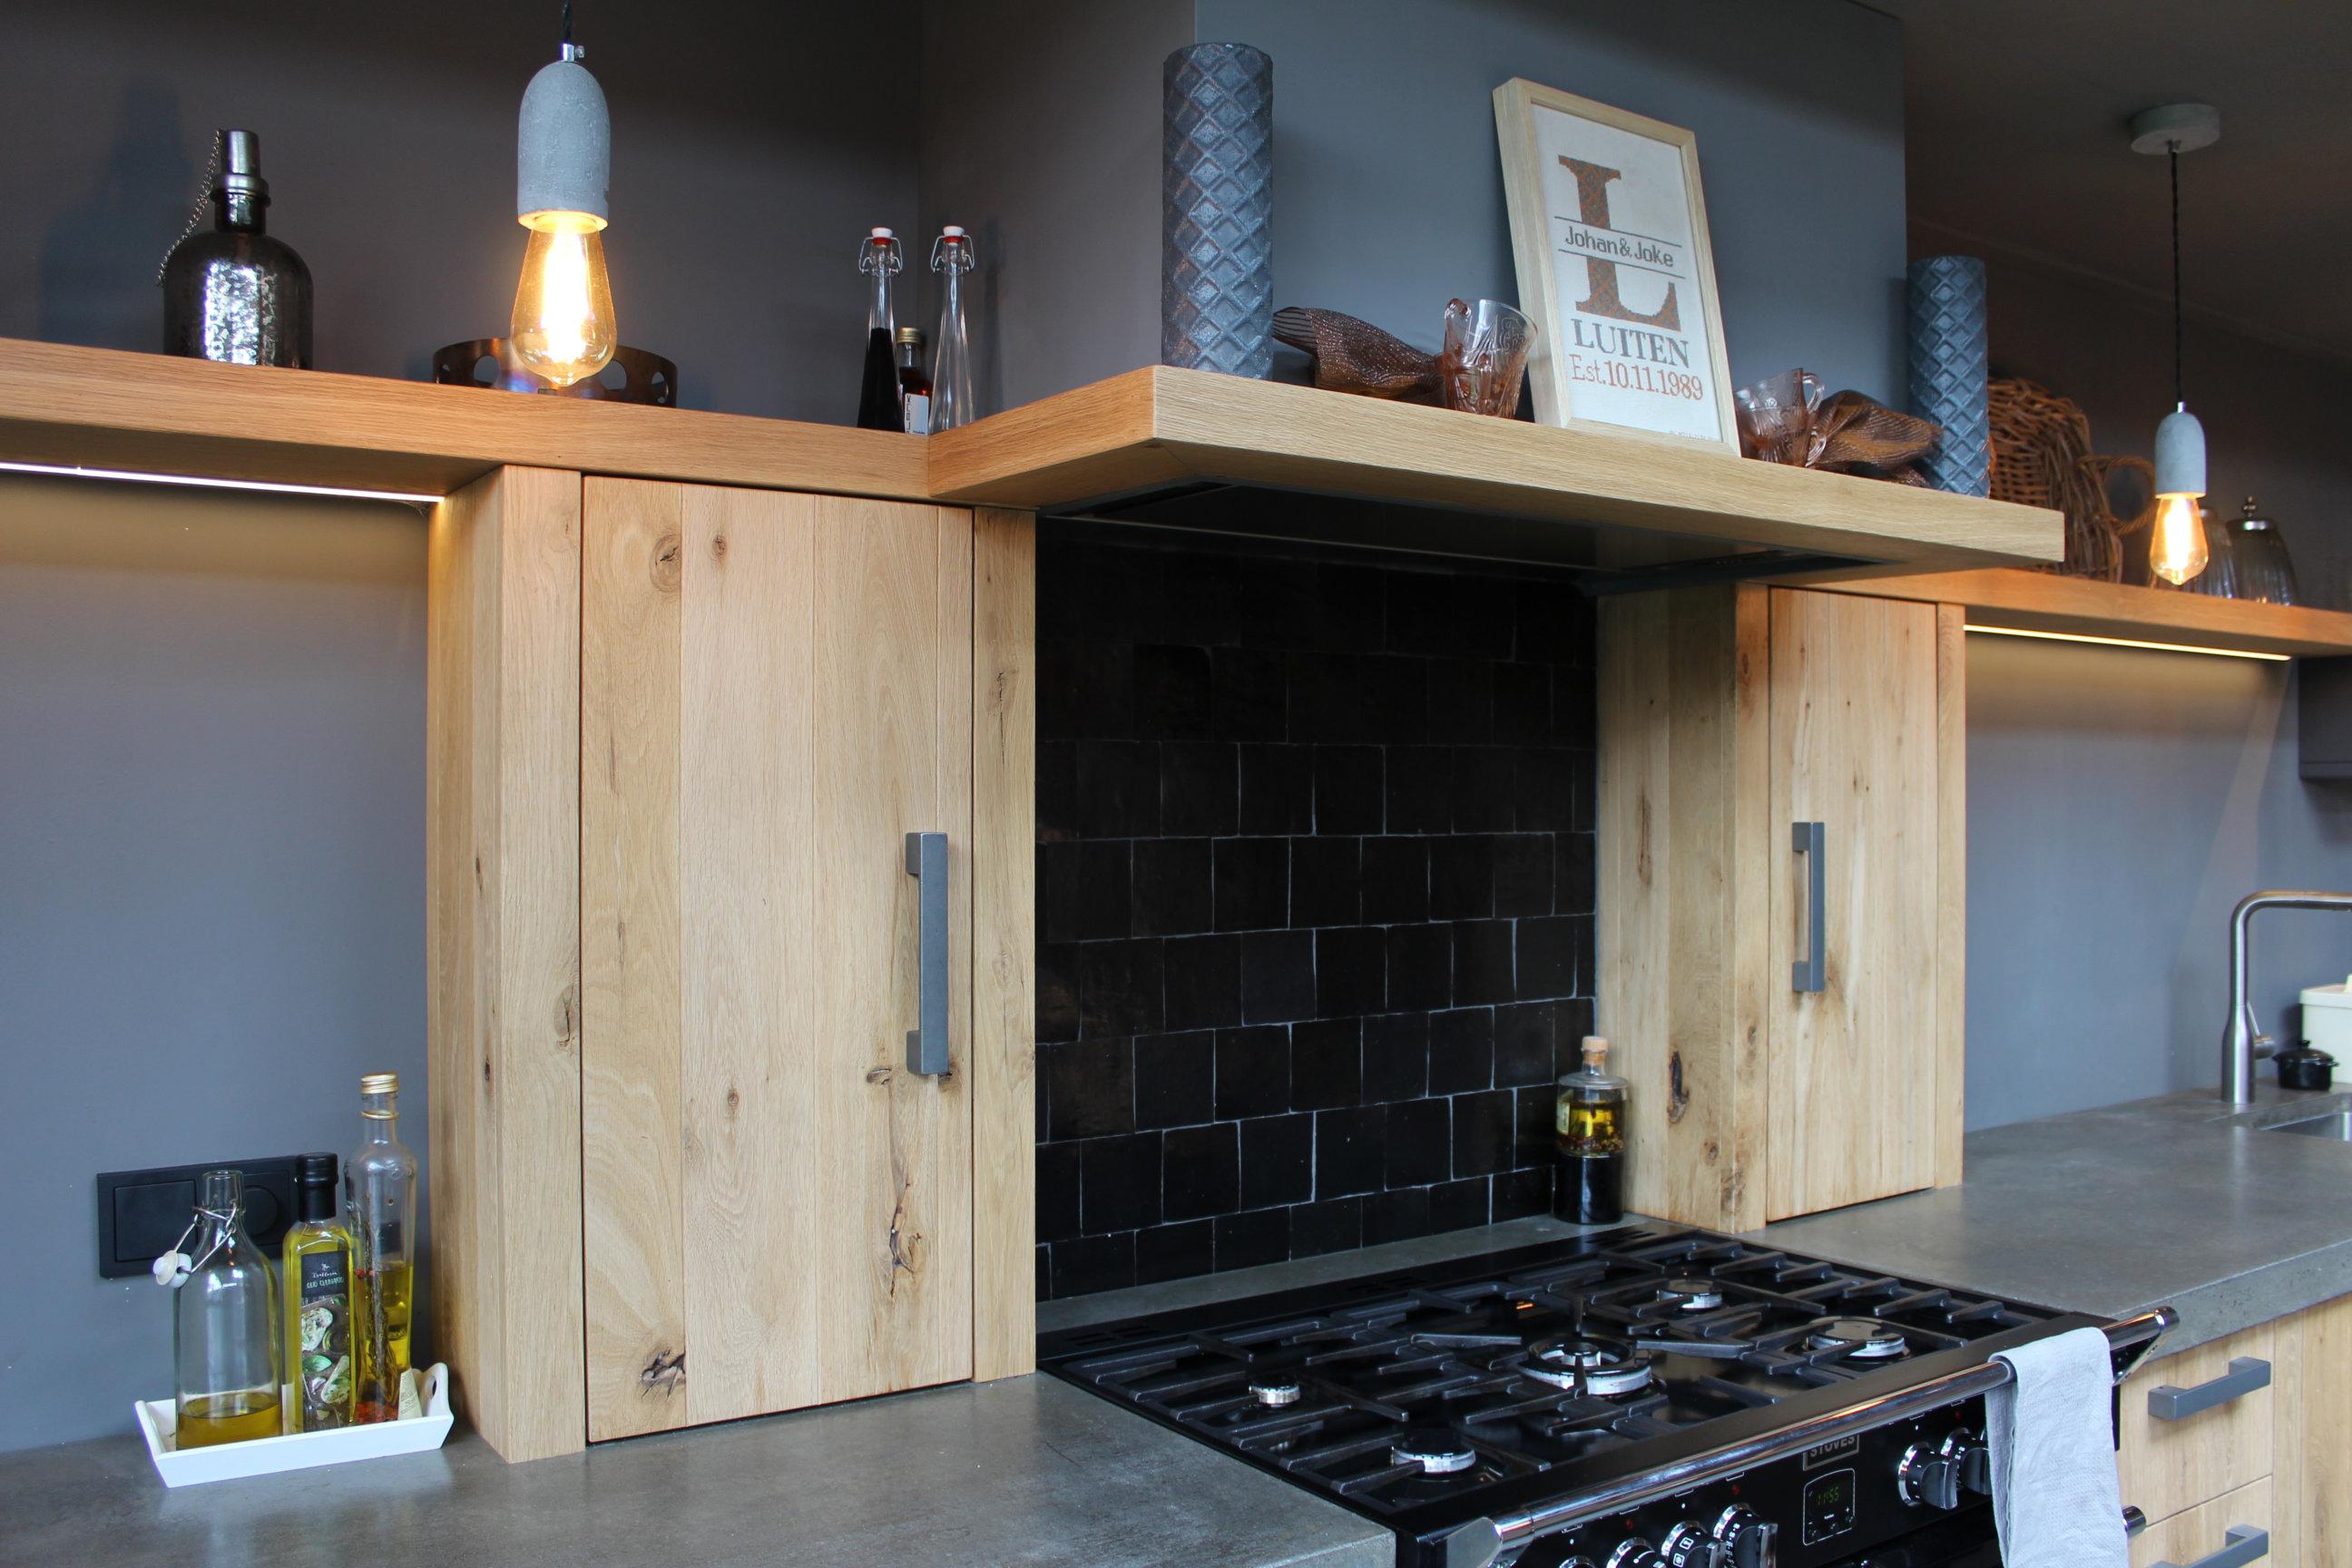 Keuken industri le stijl massief eiken geborsteld herald for Industriele stijl